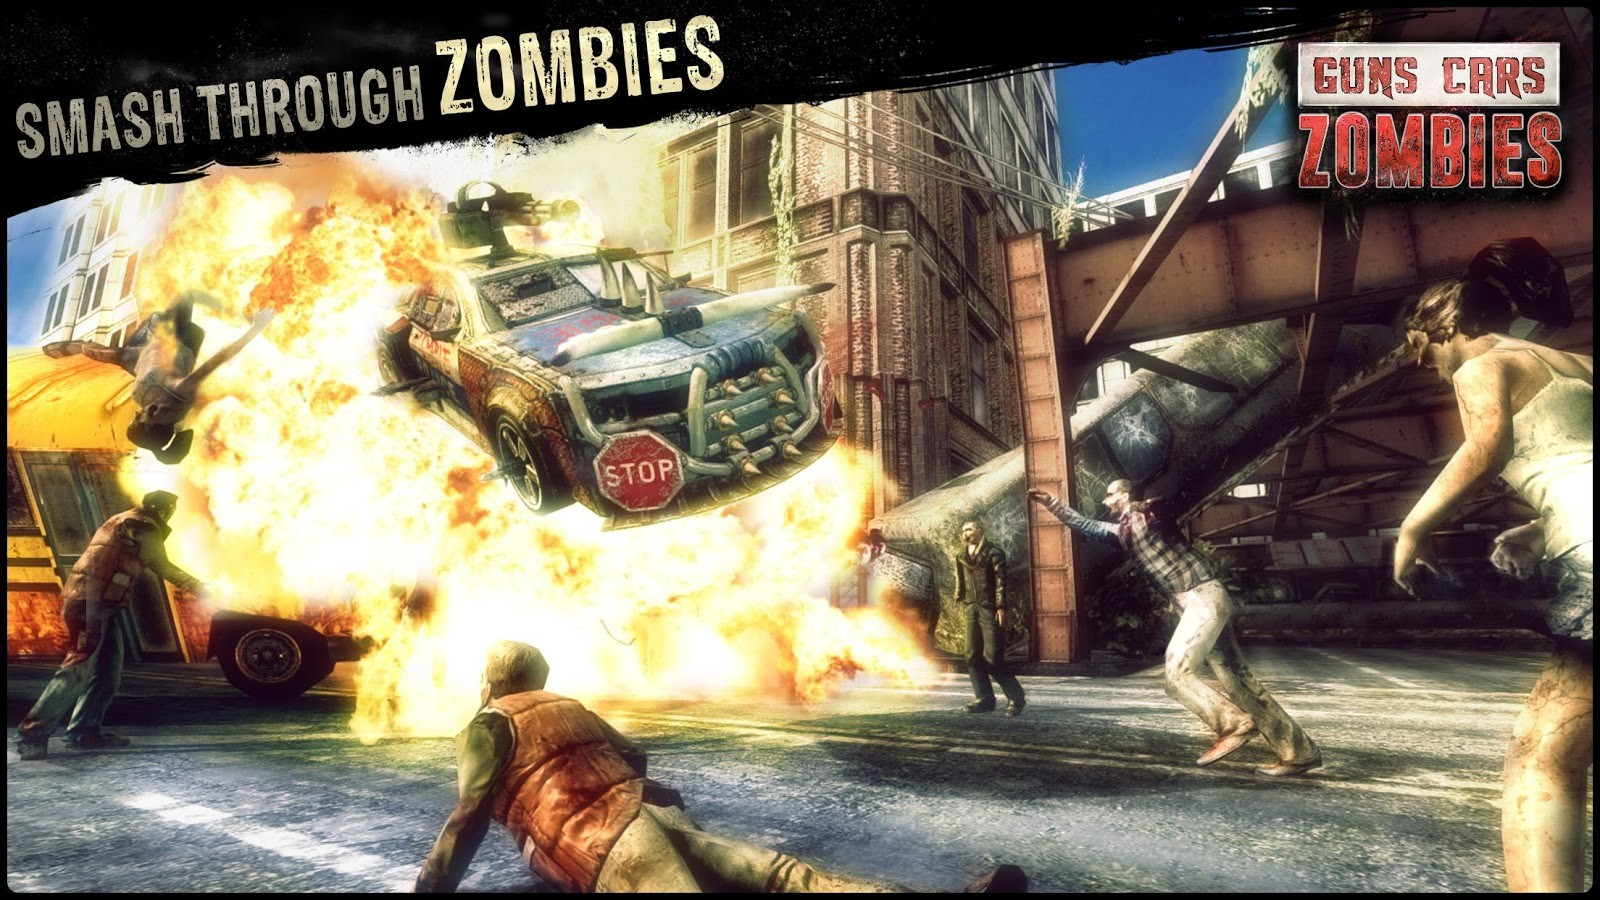 Guns, Cars, Zombies Apk